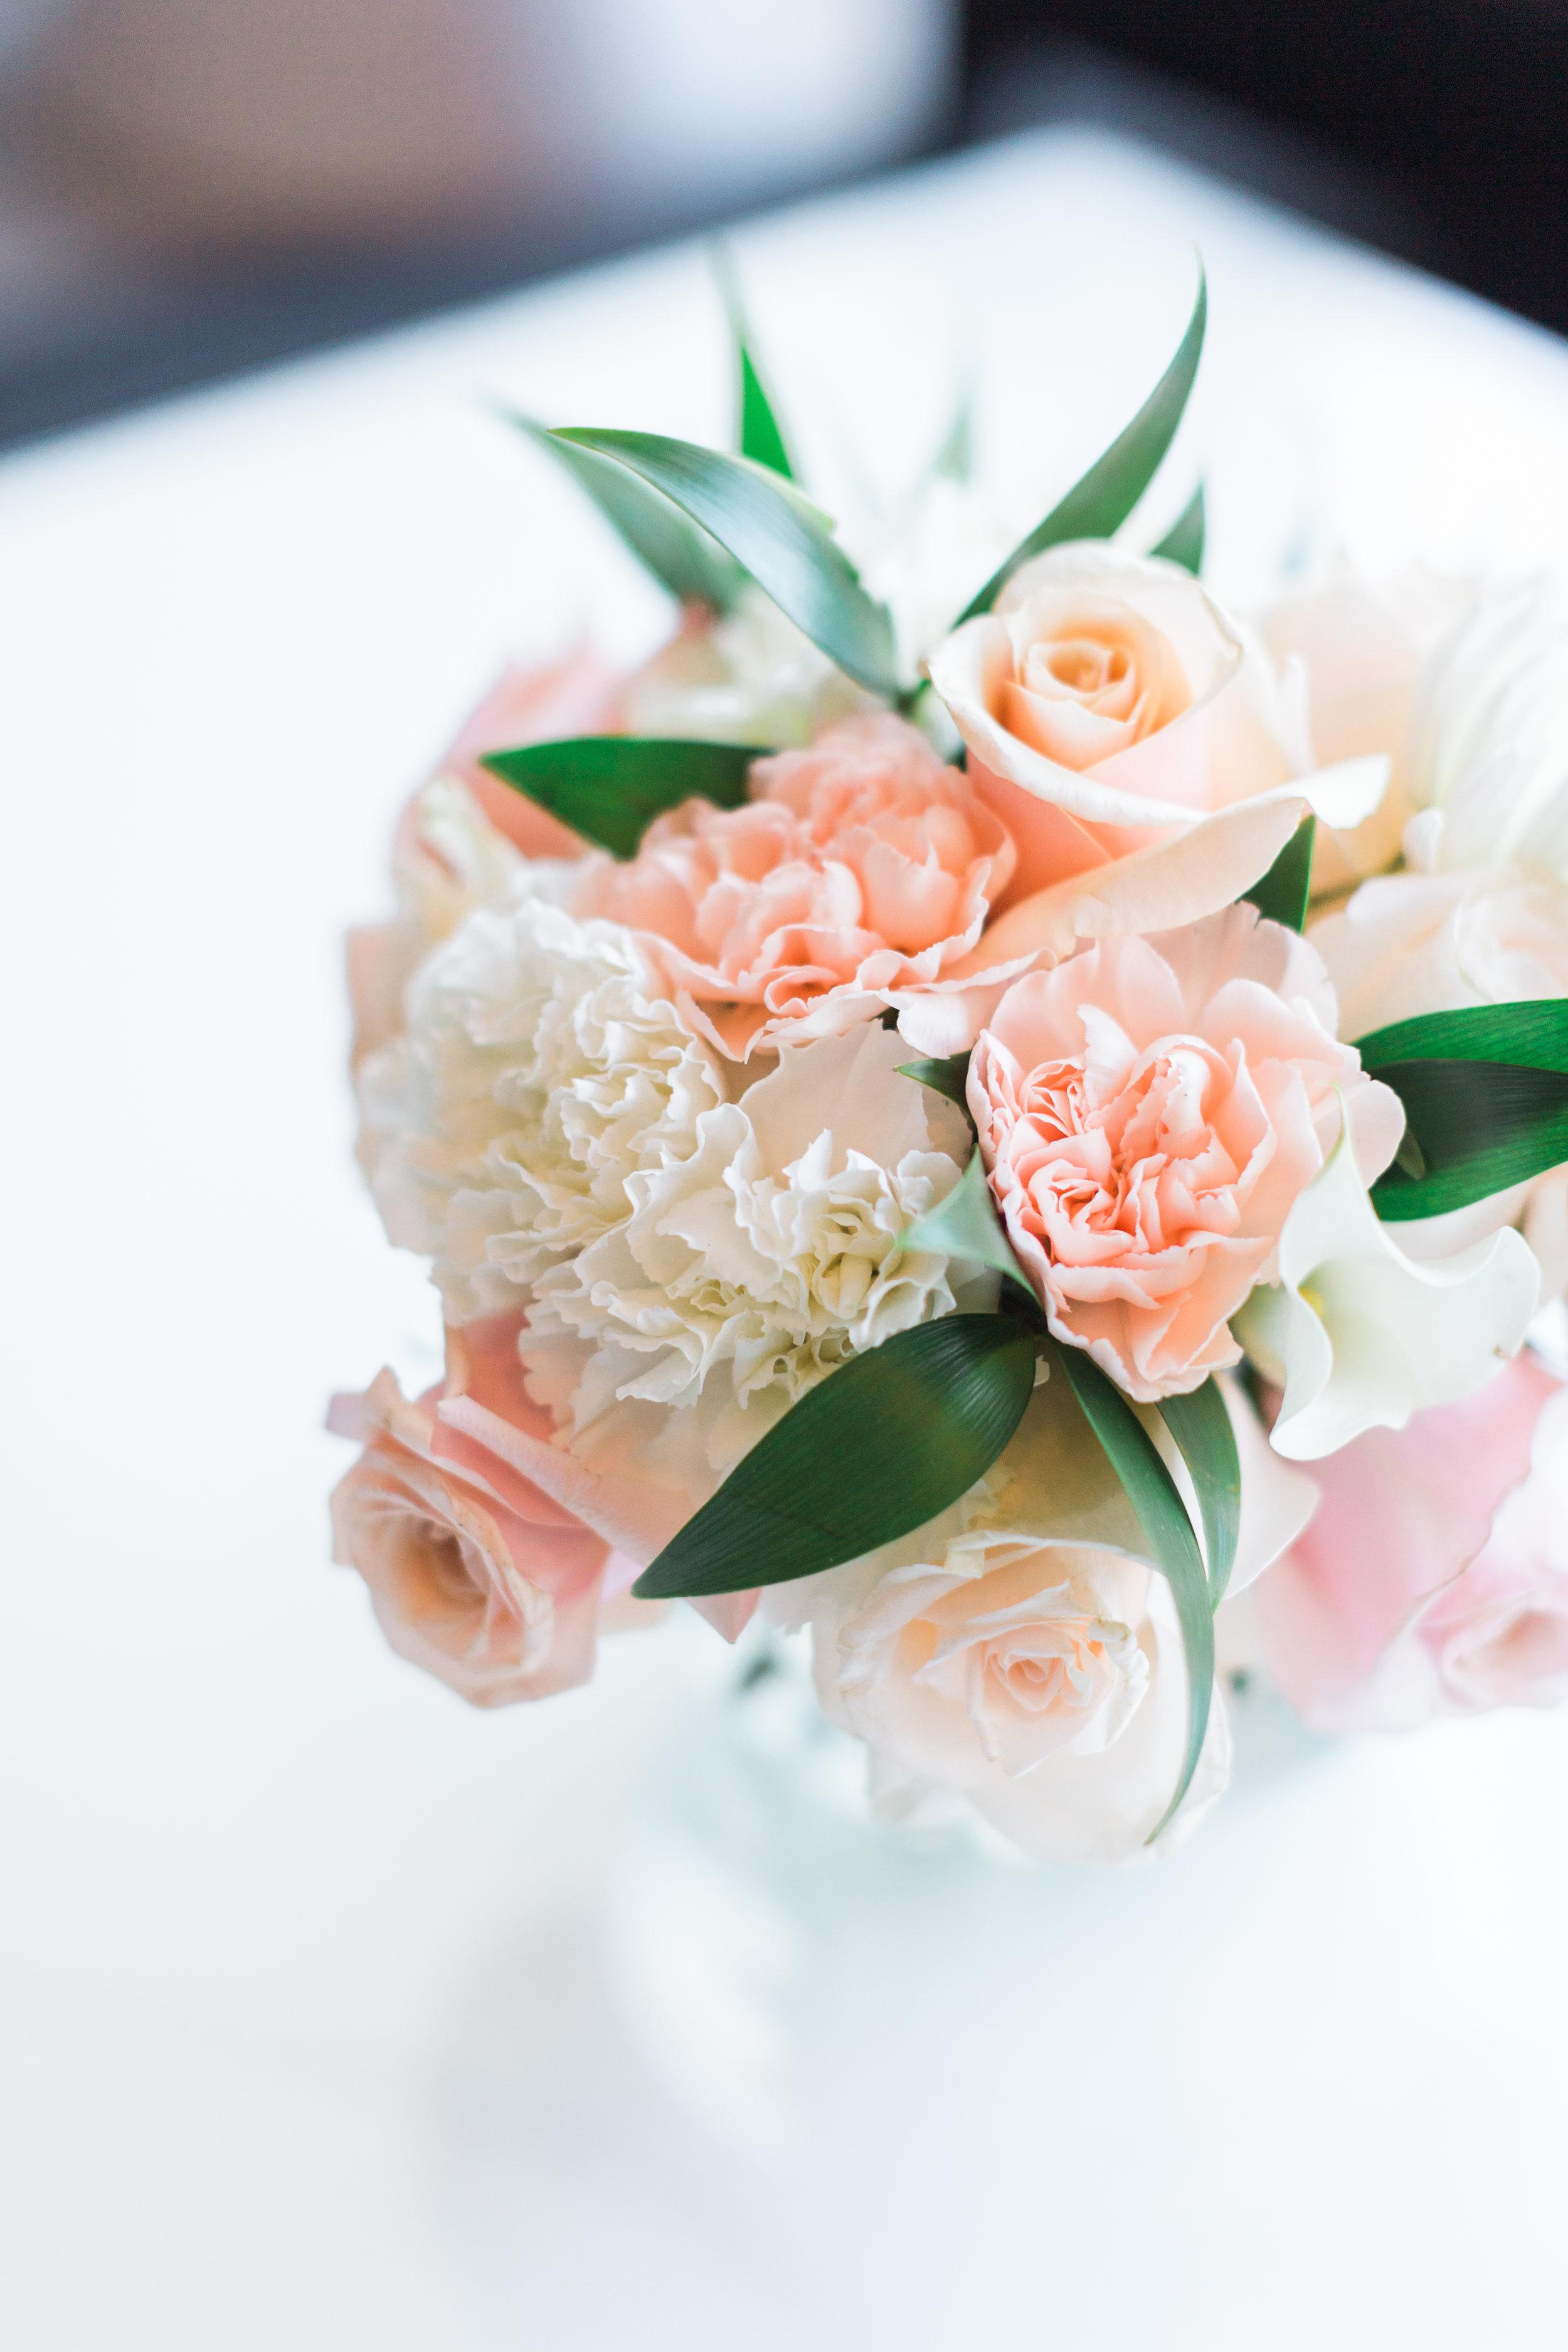 Toronto Fine Art Photographer - 180 Restaurant Wedding - Ceremony-6.jpg